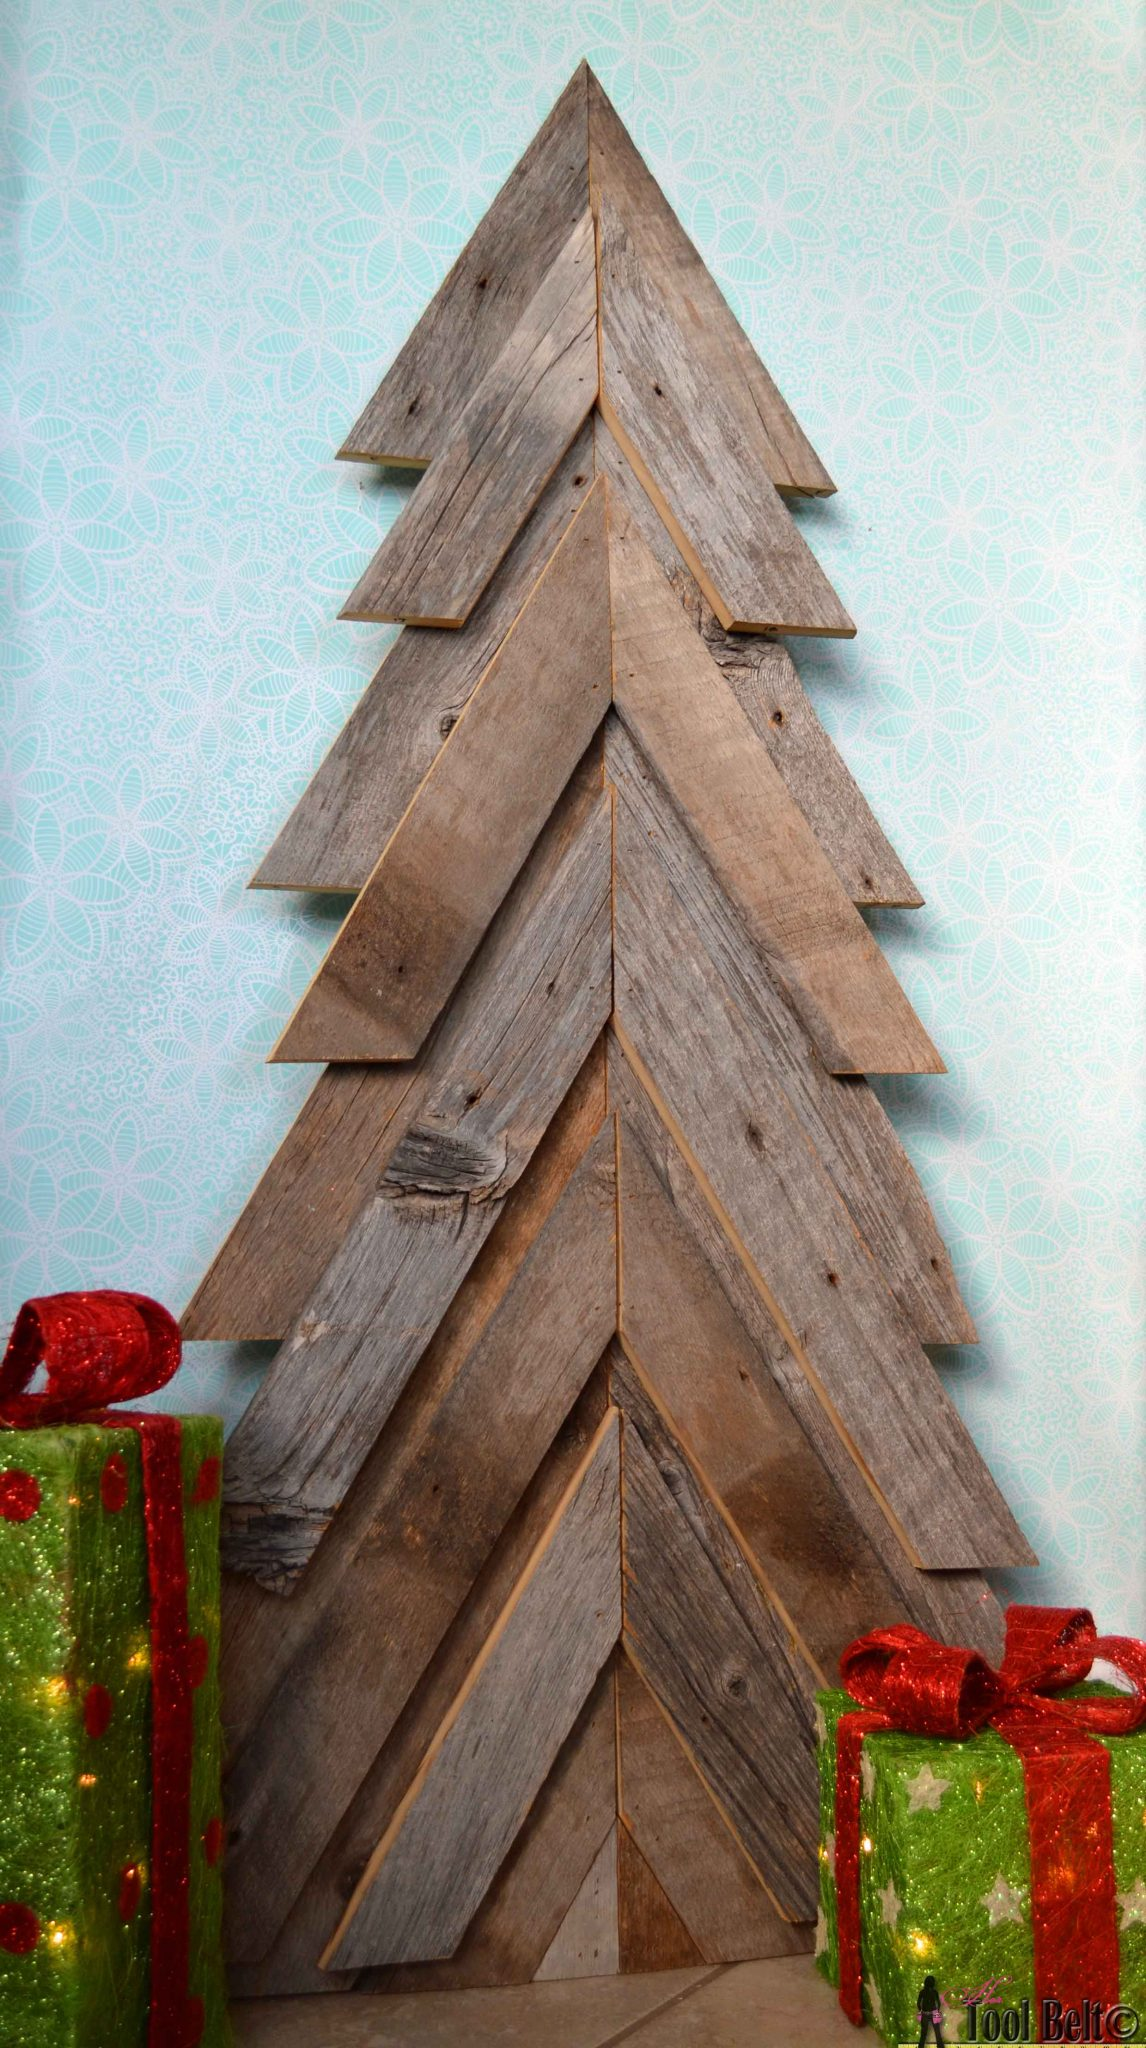 25 Rustic Wooden Tree